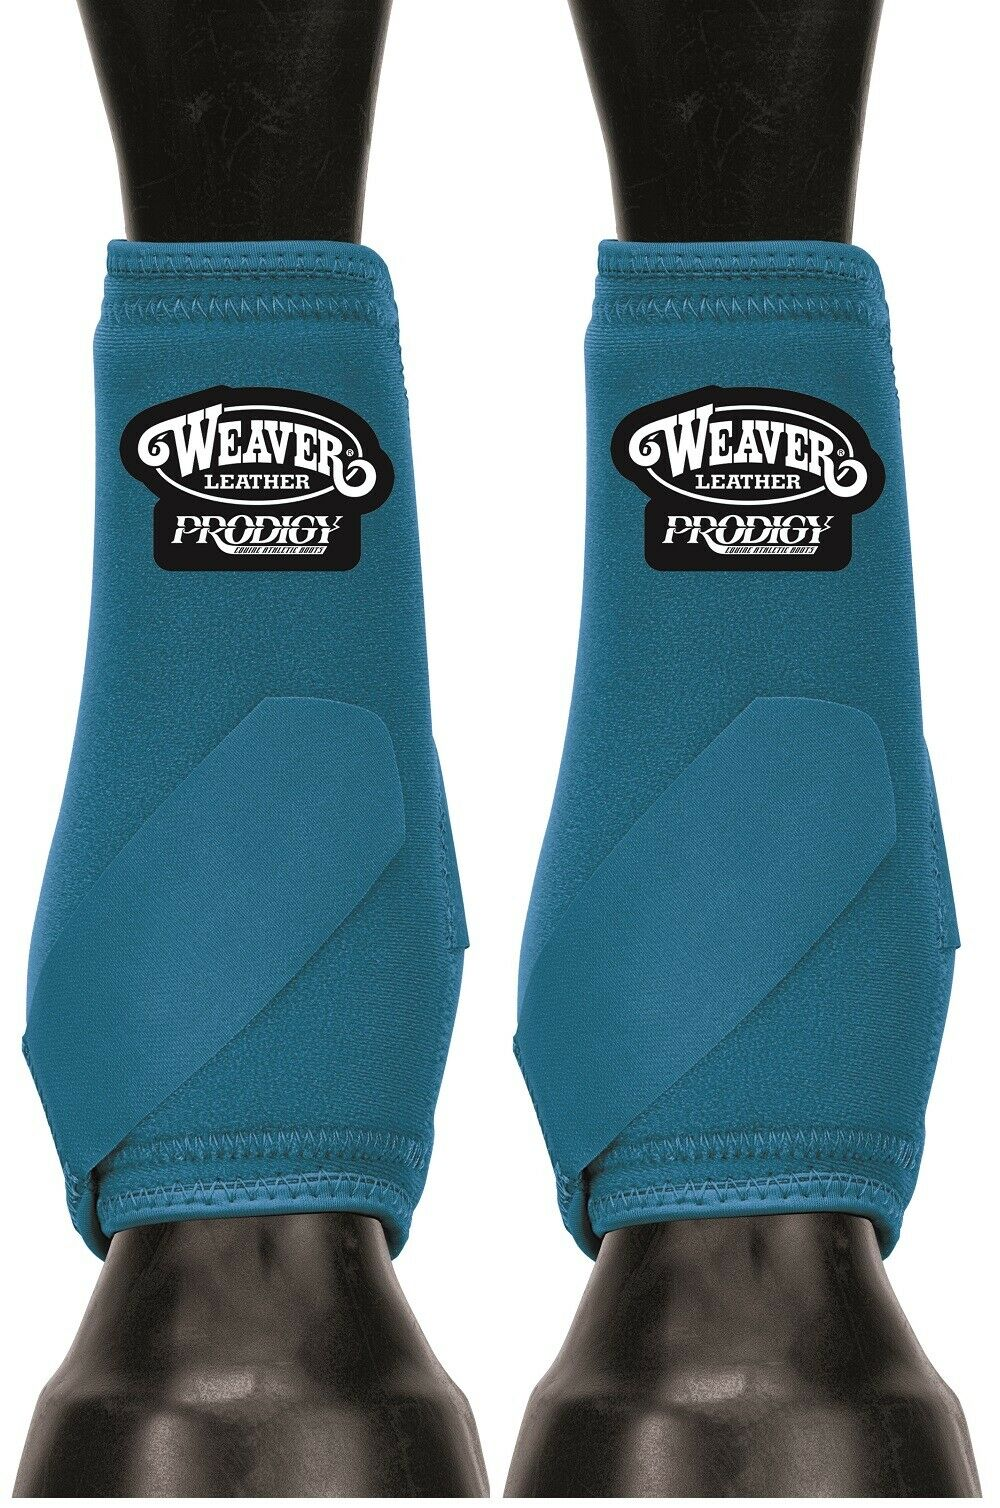 Weaver Leather Original prodigio Performance atlética pequeñas y medianas empresas botas 2 Pack Turquesa